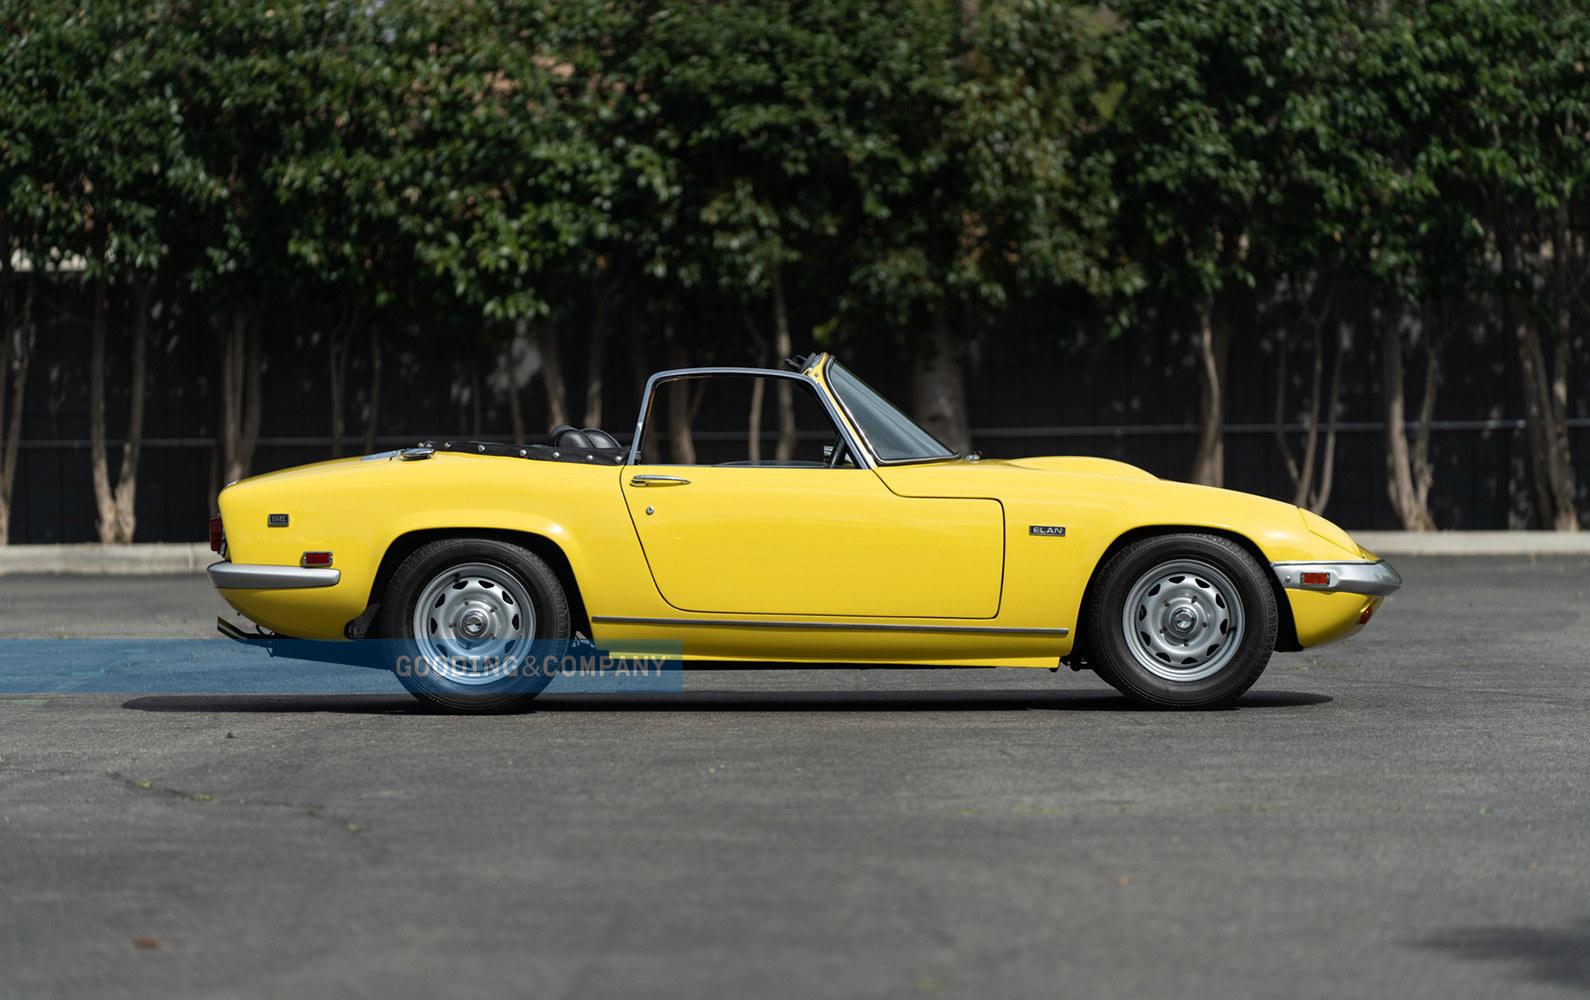 Yellow 1969 Lotus Elan SE-Convertible Passenger Side at Gooding Auction. Lease a Lotus wth Premier